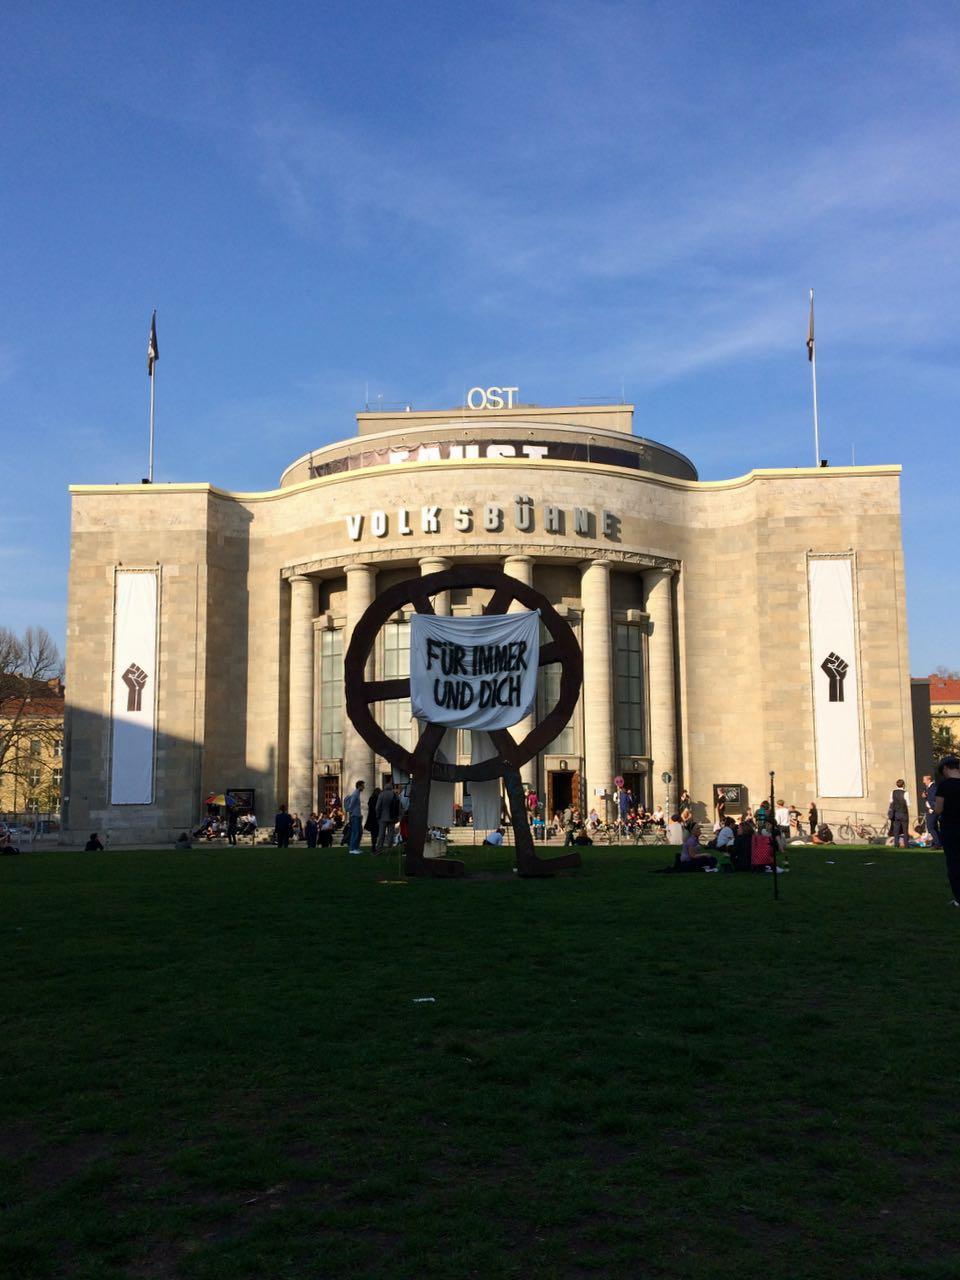 Volksbühne am Rosa-Luxenburg-Platz / カストロフ退任とフォルクスビューネの行方